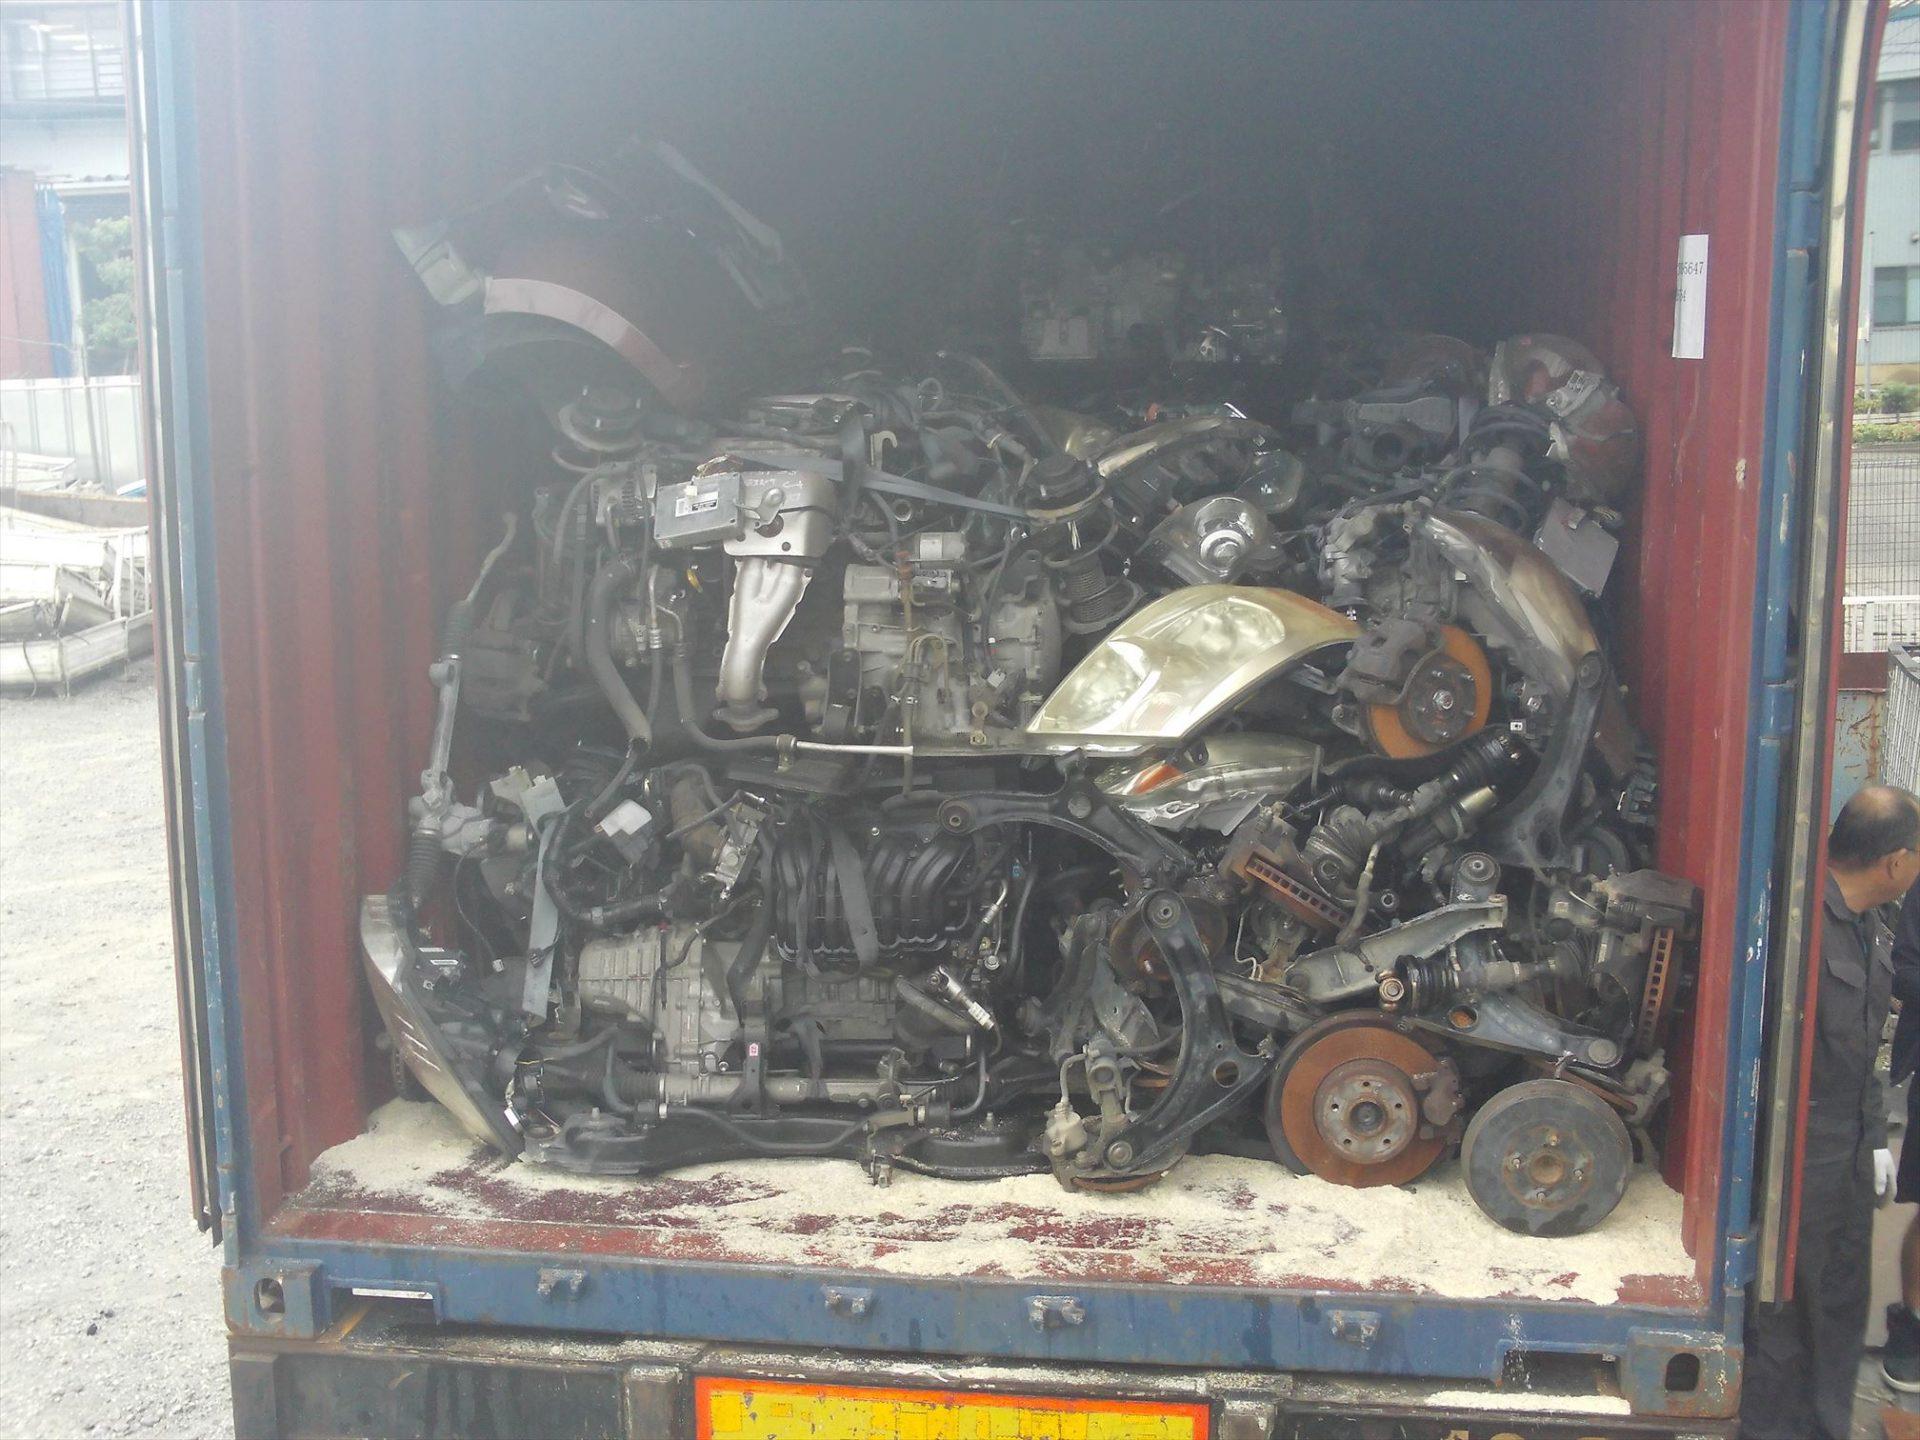 used parts japan, japan used car parts, used car parts, 中古車部品輸出, 中古部品輸出